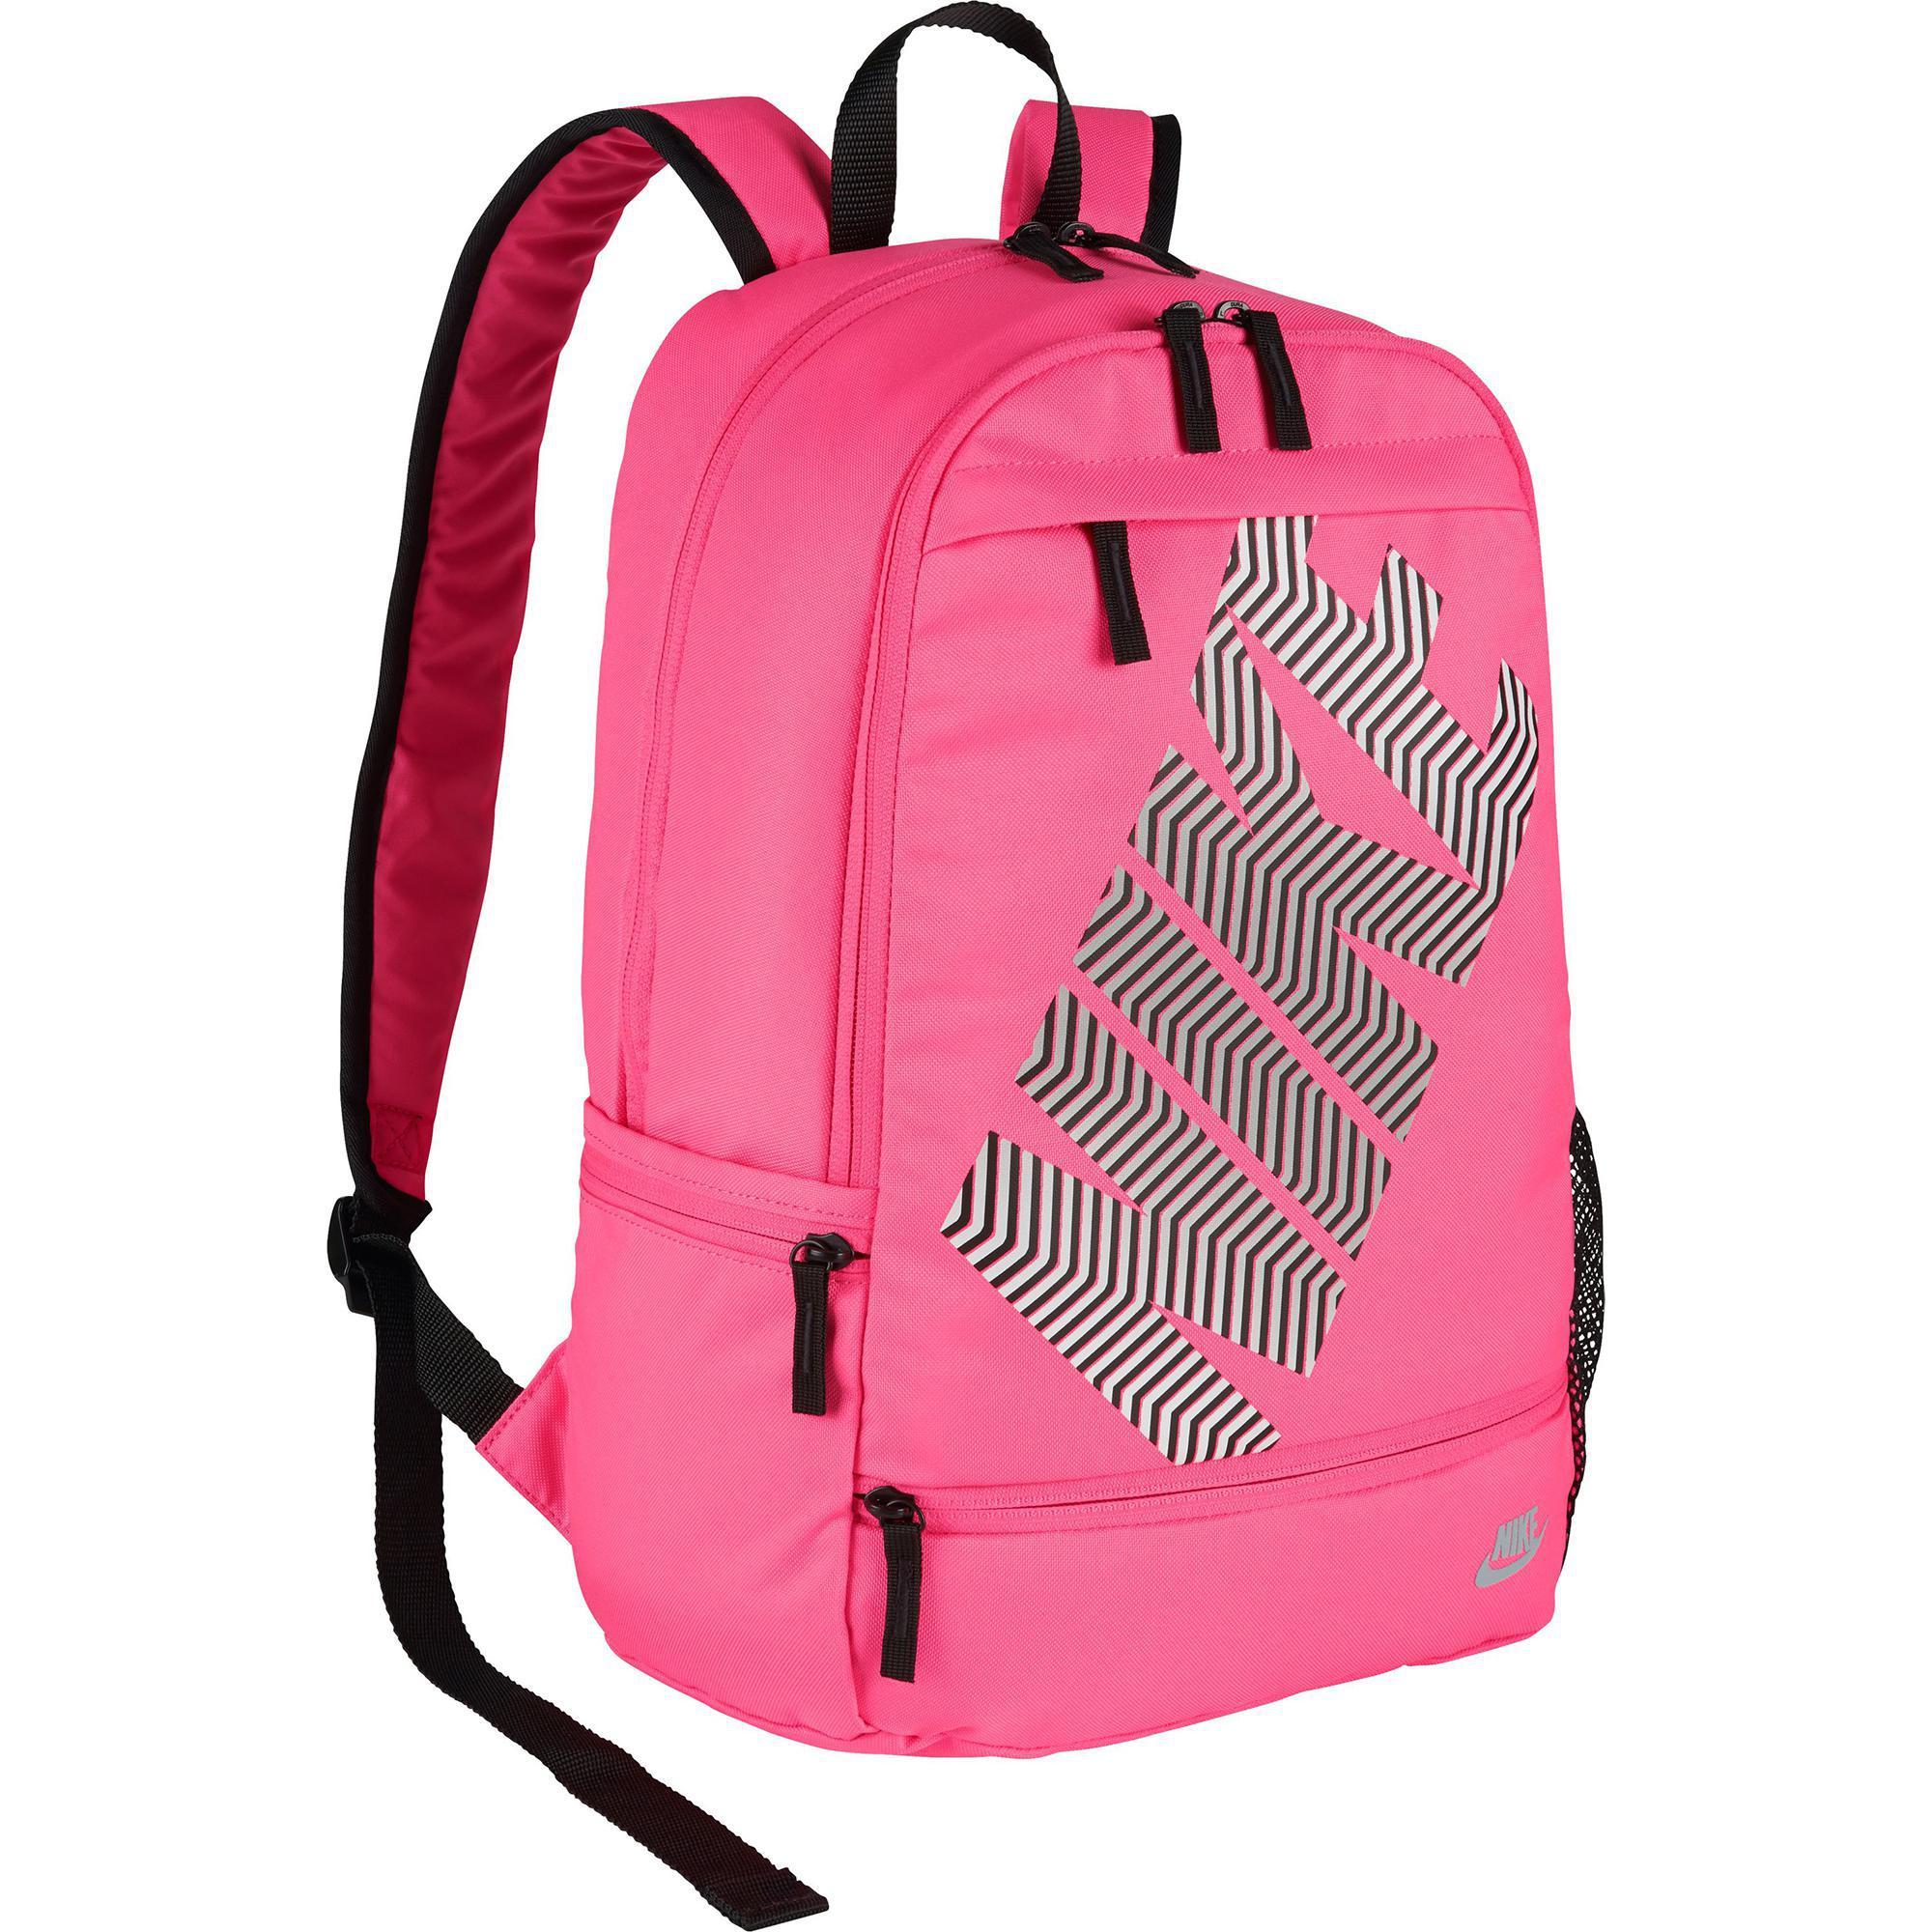 Nike Classic North Solid Backpack - Pink - Tennisnuts.com